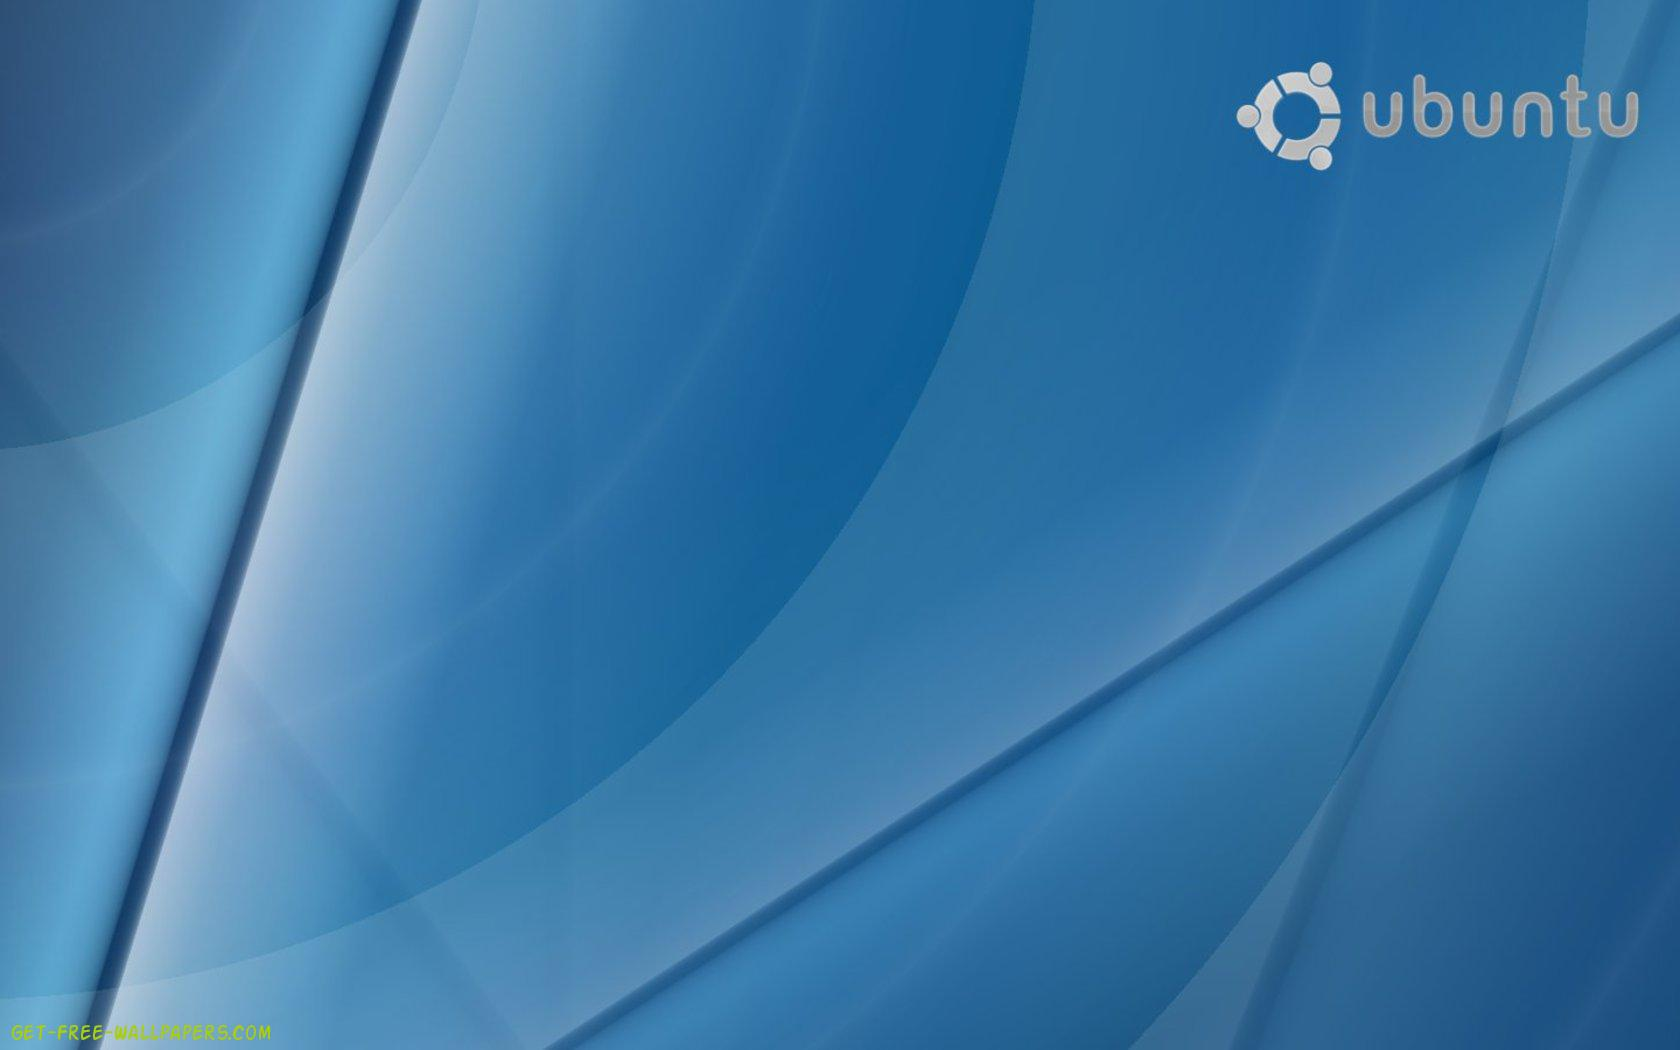 Download Blue Ubuntu Wallpaper 1680x1050